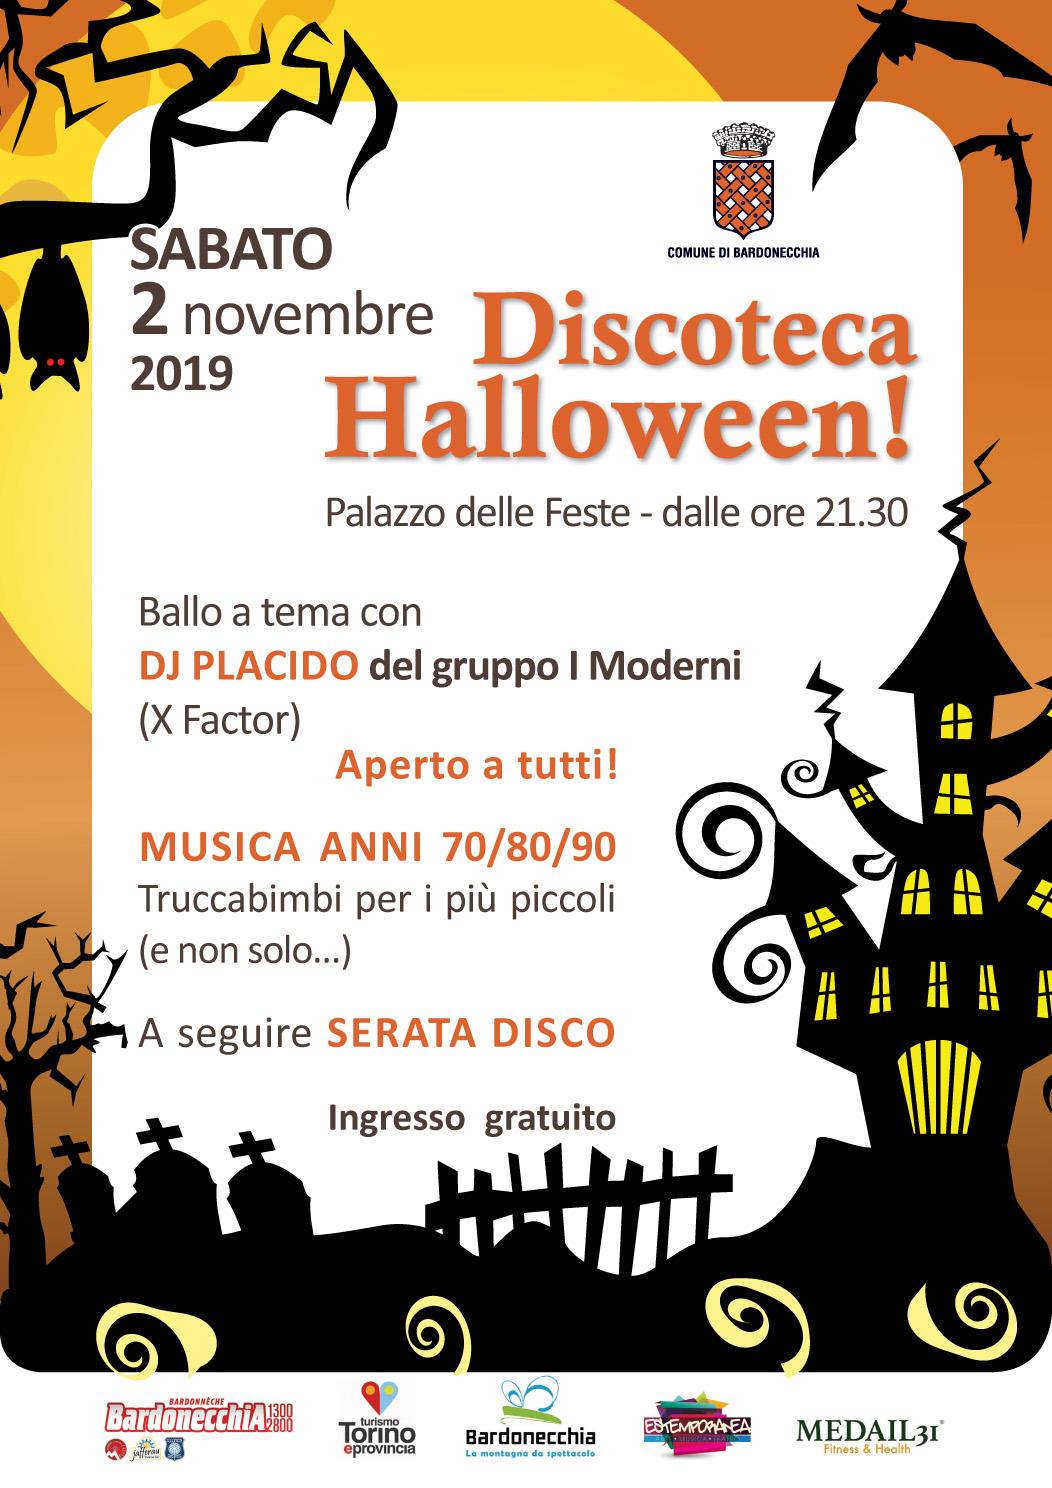 Bardonecchia eventi - Discoteca Halloween